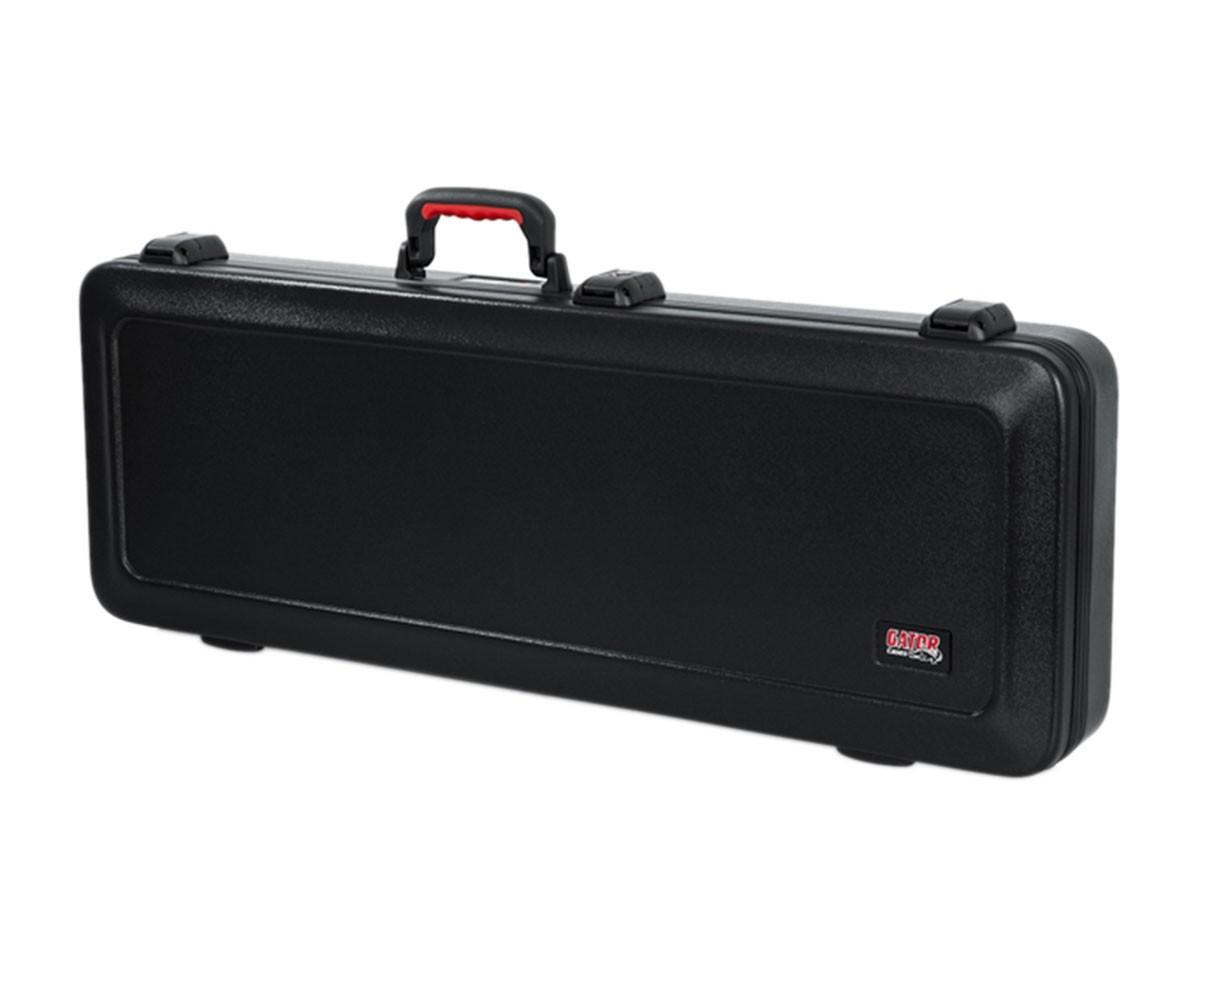 Gator TSA Series ATA Molded Polyethylene Guitar Case for Standard Electric Guitars